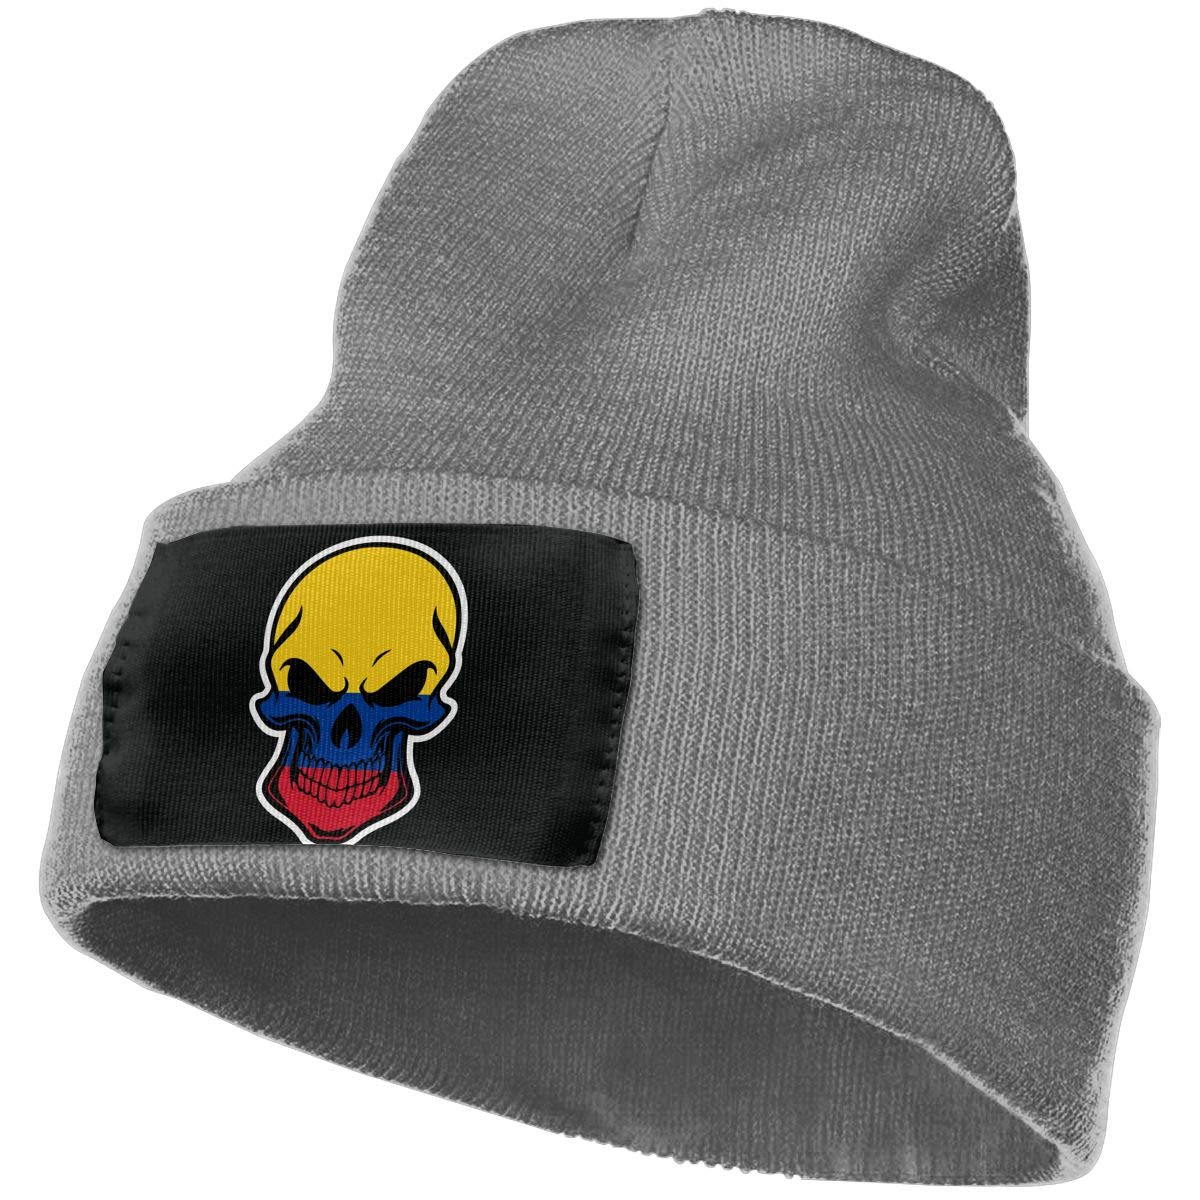 MXMAOM9MX Colombia Flag Skull-1 Warm Knitting Hat Mens Womens 100/% Acrylic Skull Cap